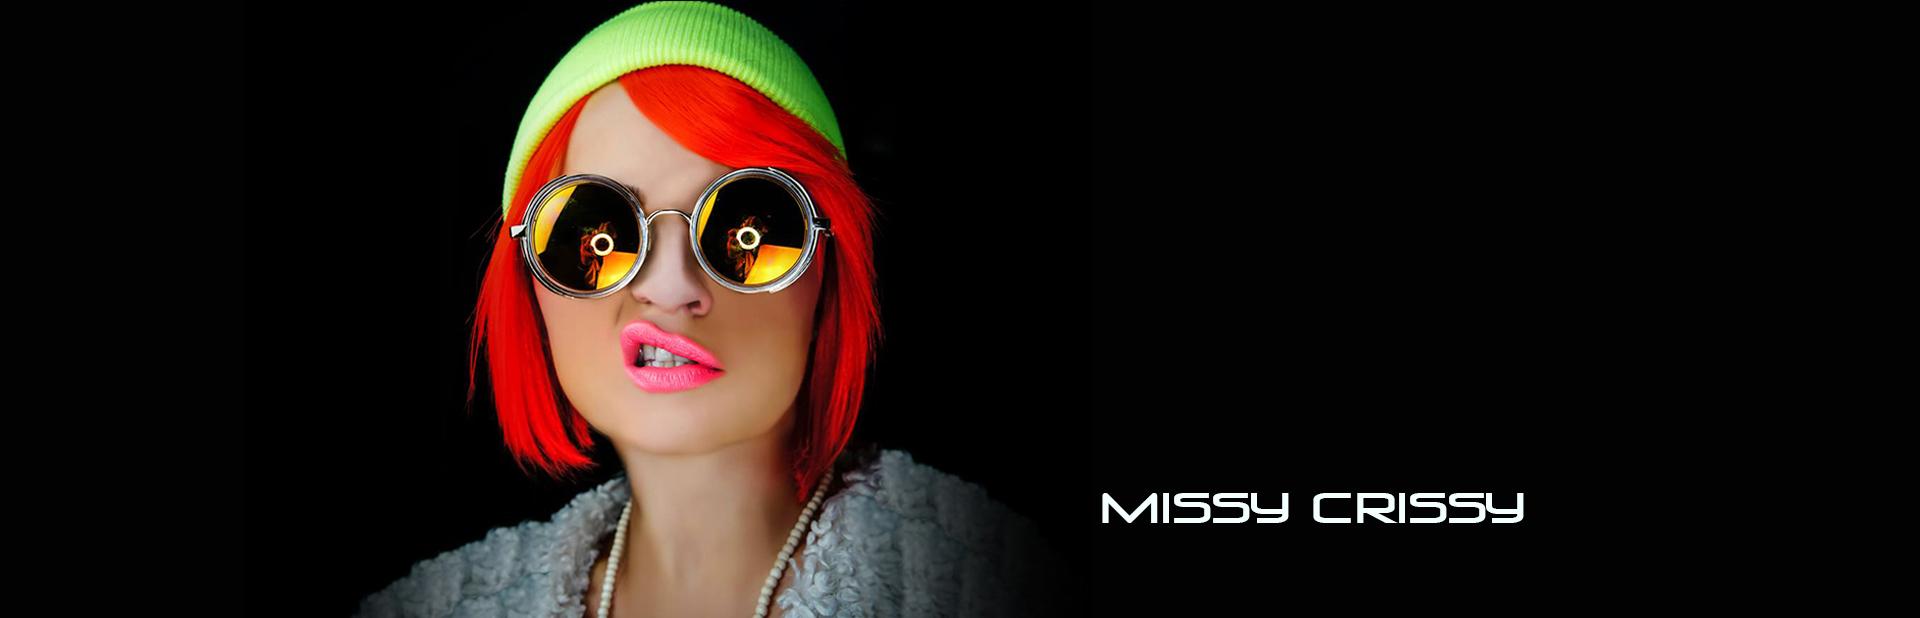 missycrissy-02